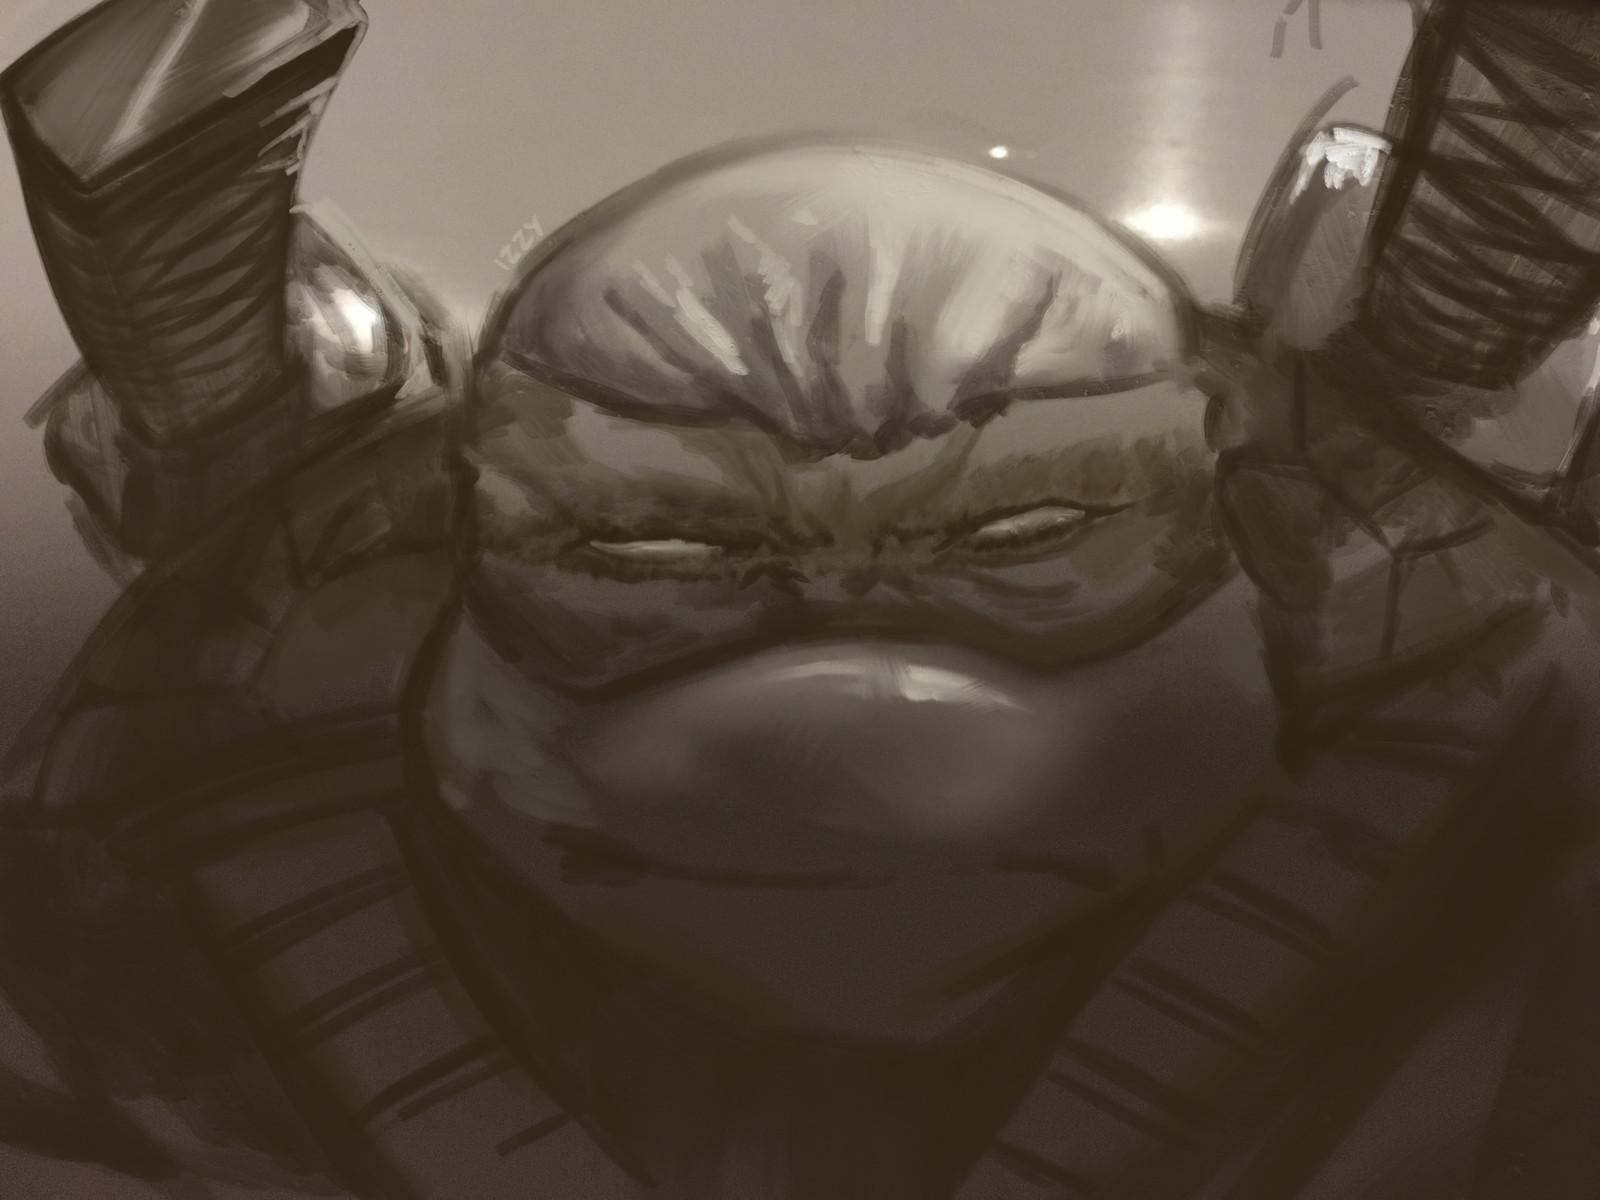 Ninja turtle scribble